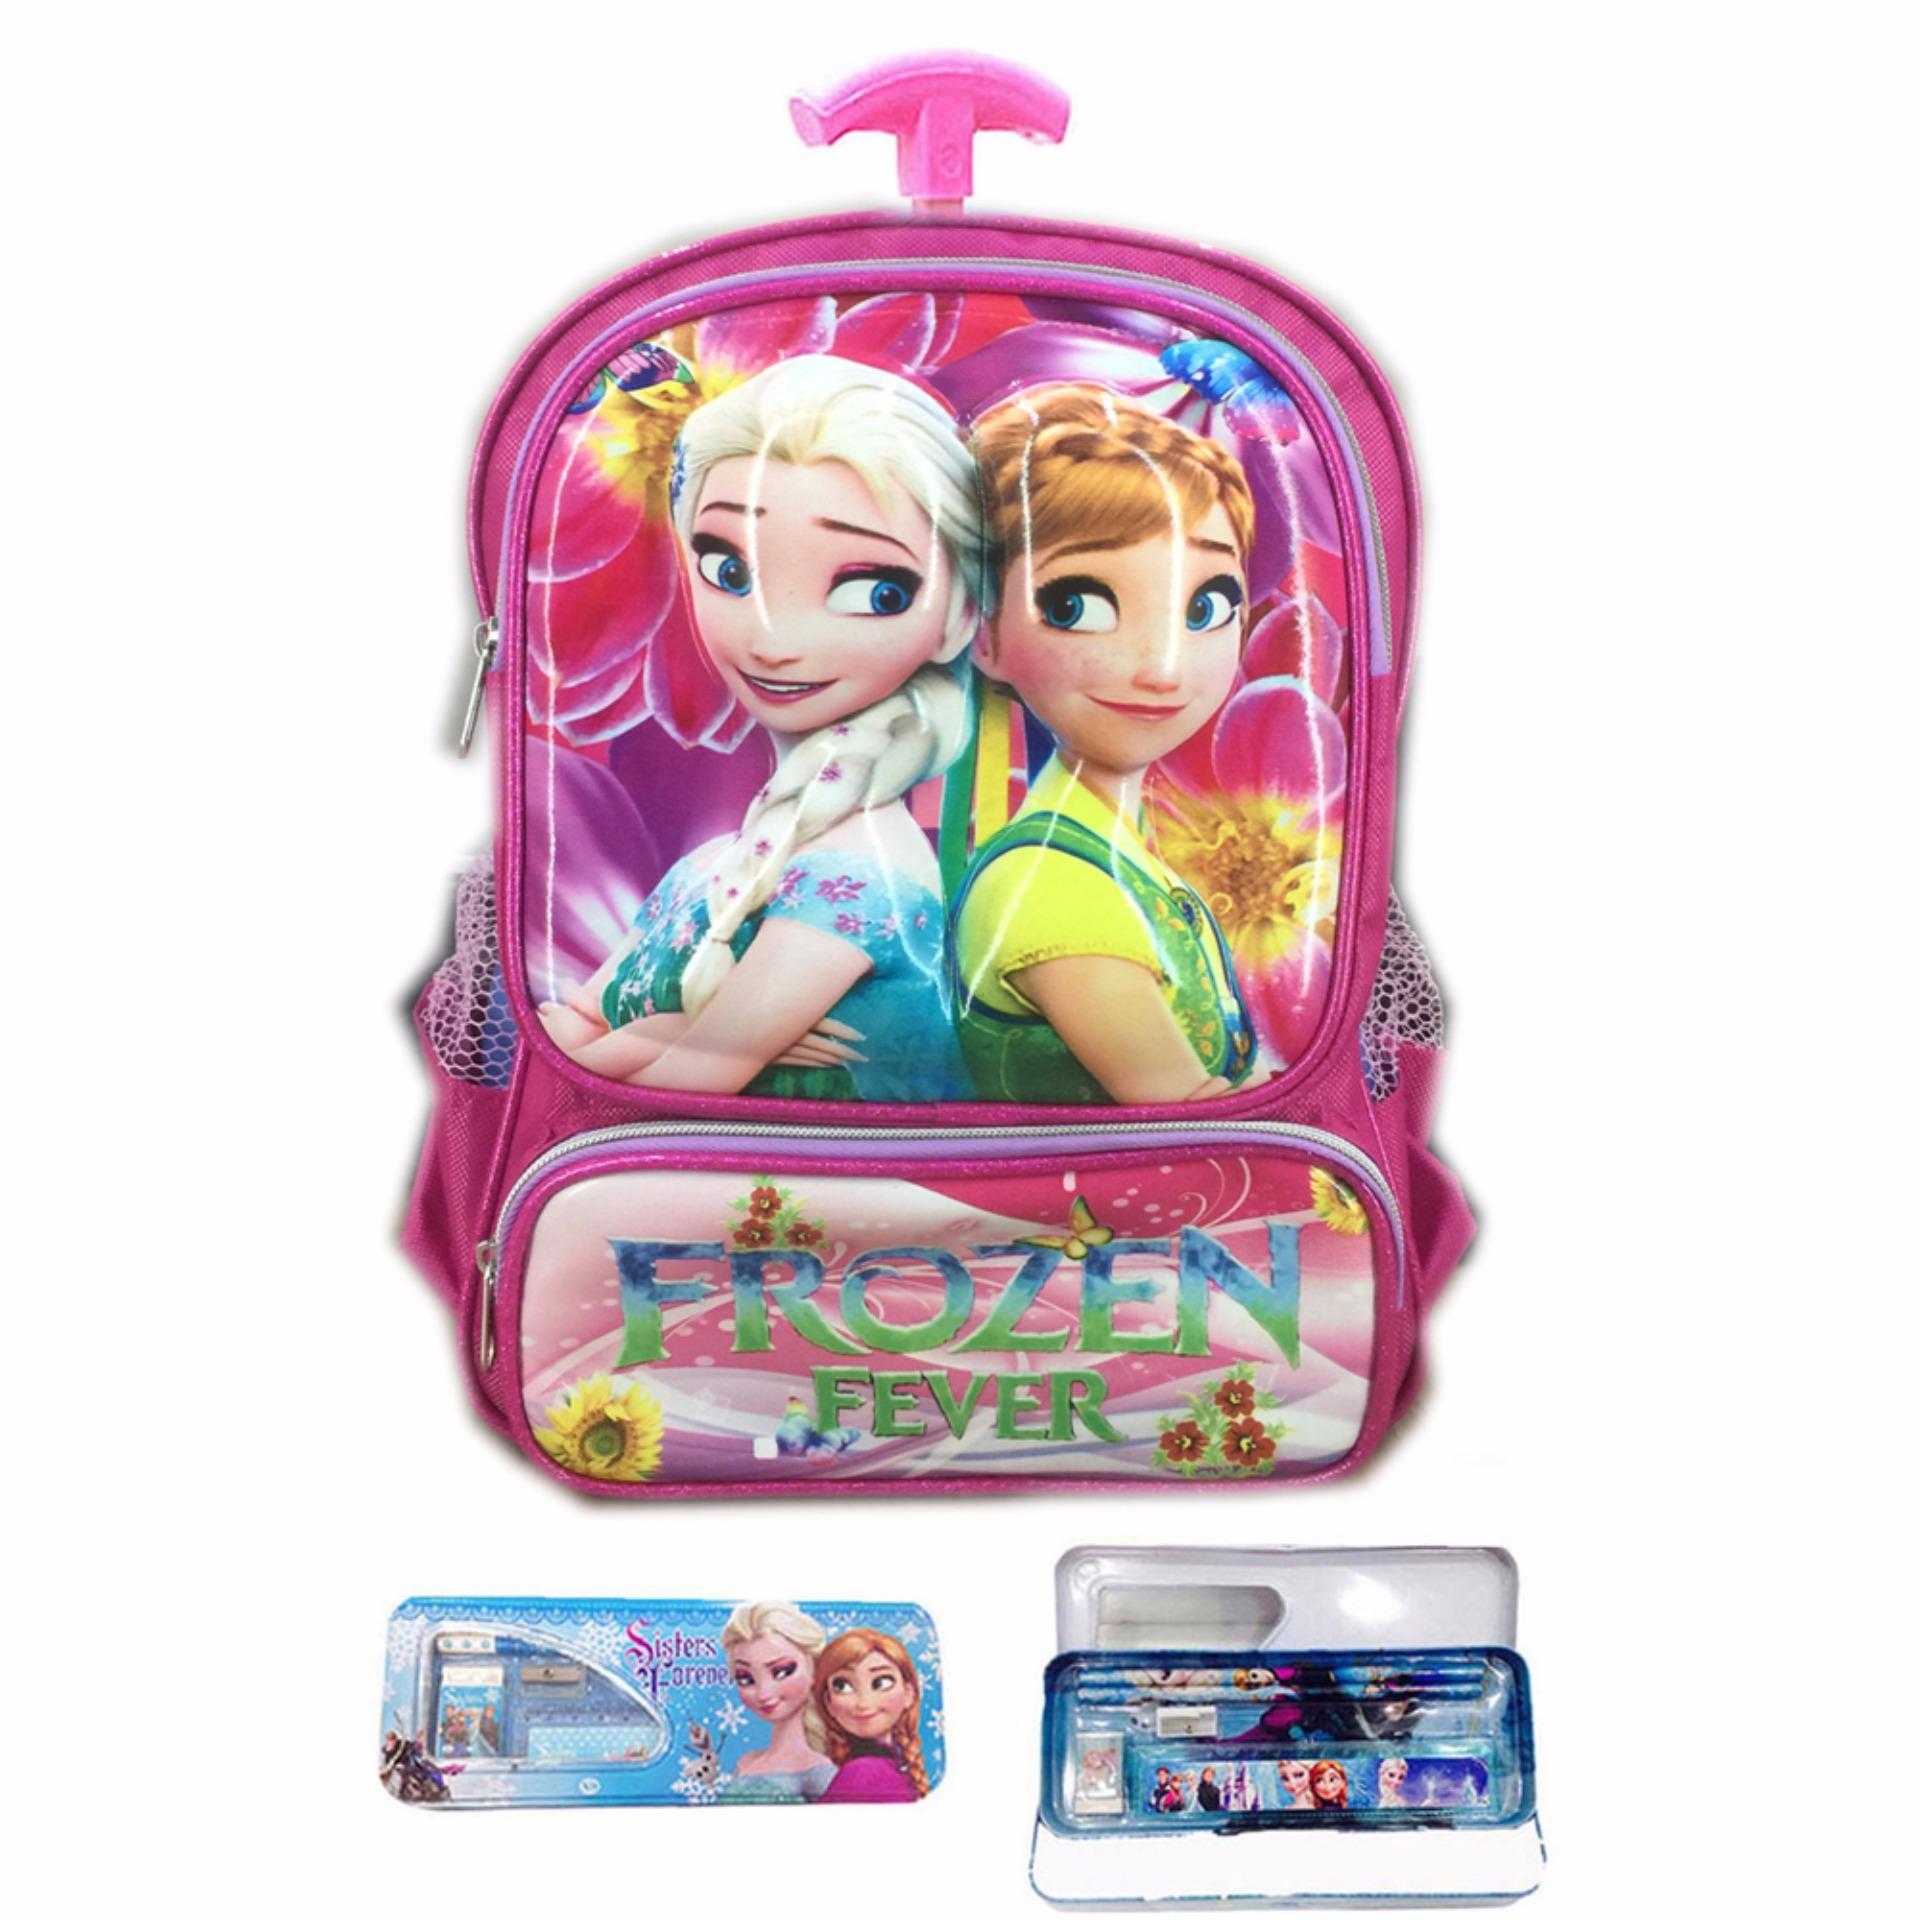 ... Kuat dan bahan nya IMPORT BGC Tas Troley Sekolah Anak TK Frozen Fever 3D Timbul Hard